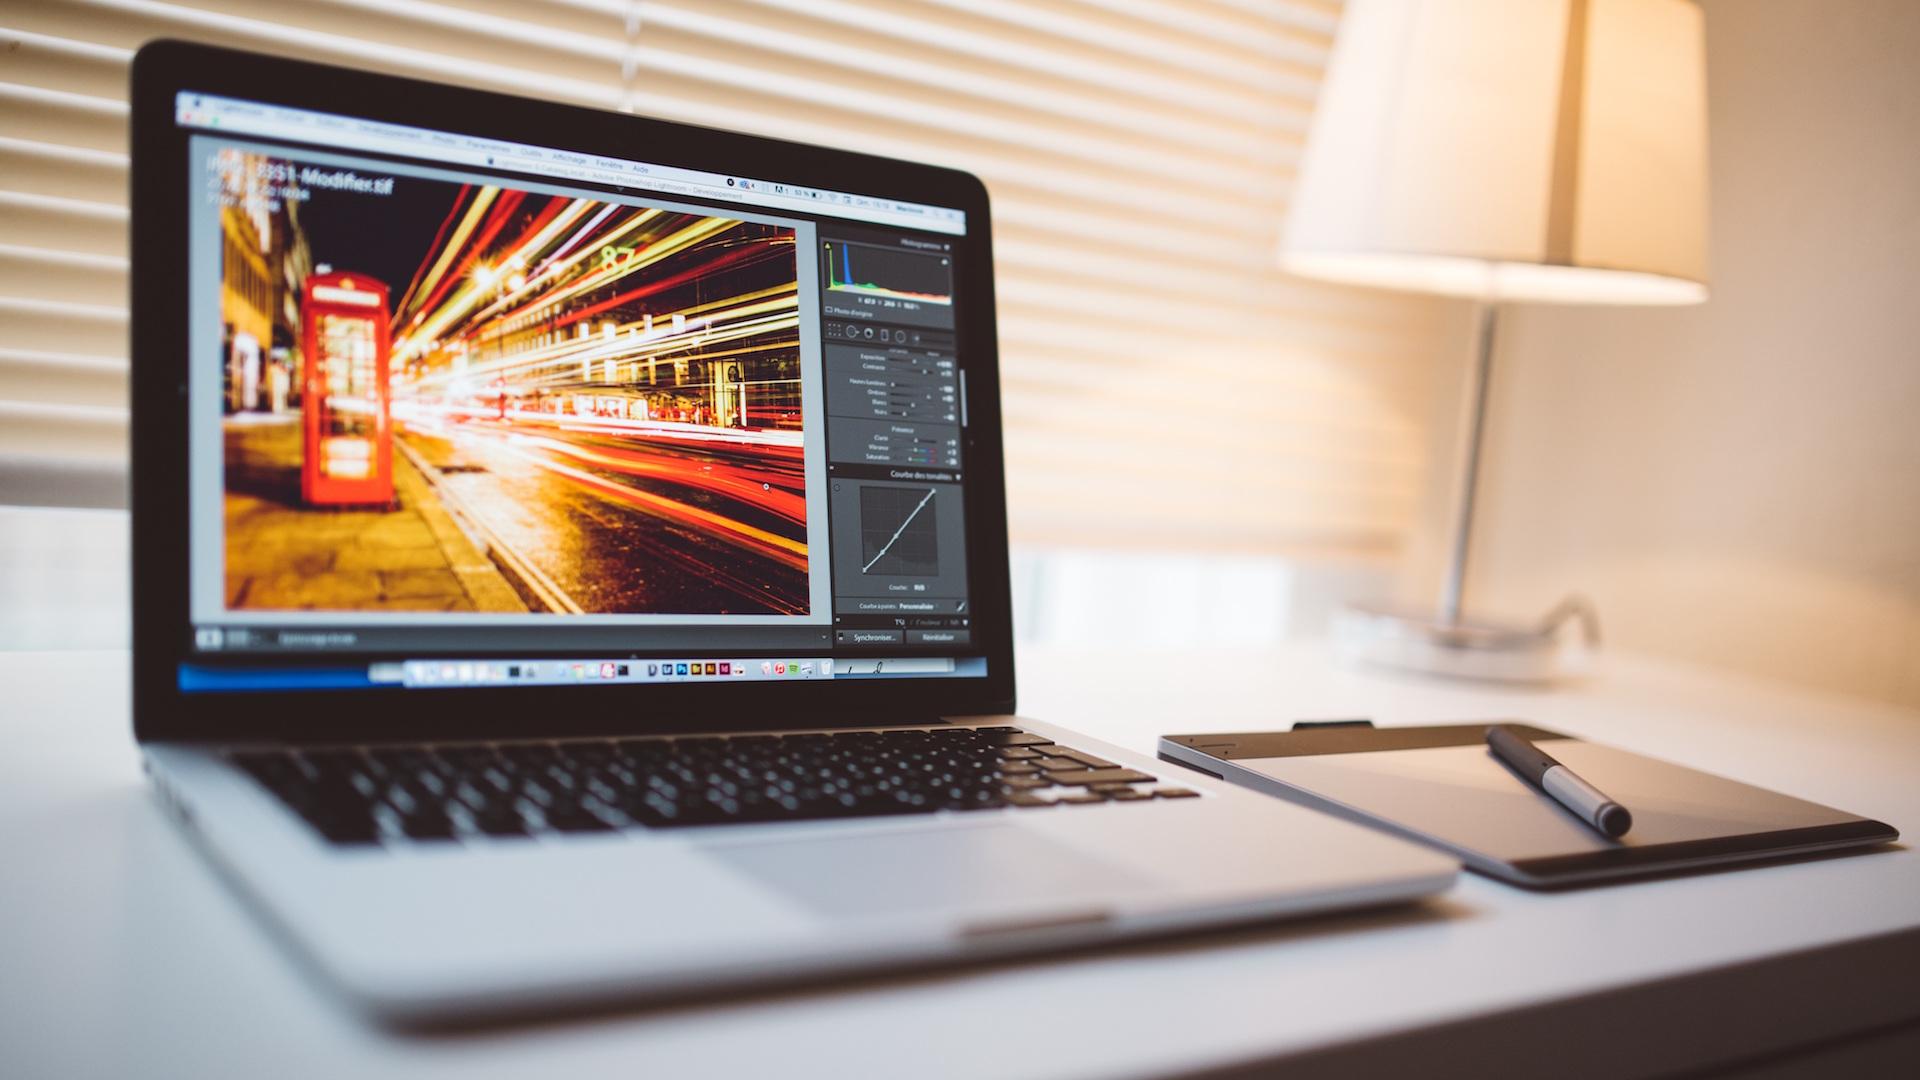 Adobe Lightroom Photoshop